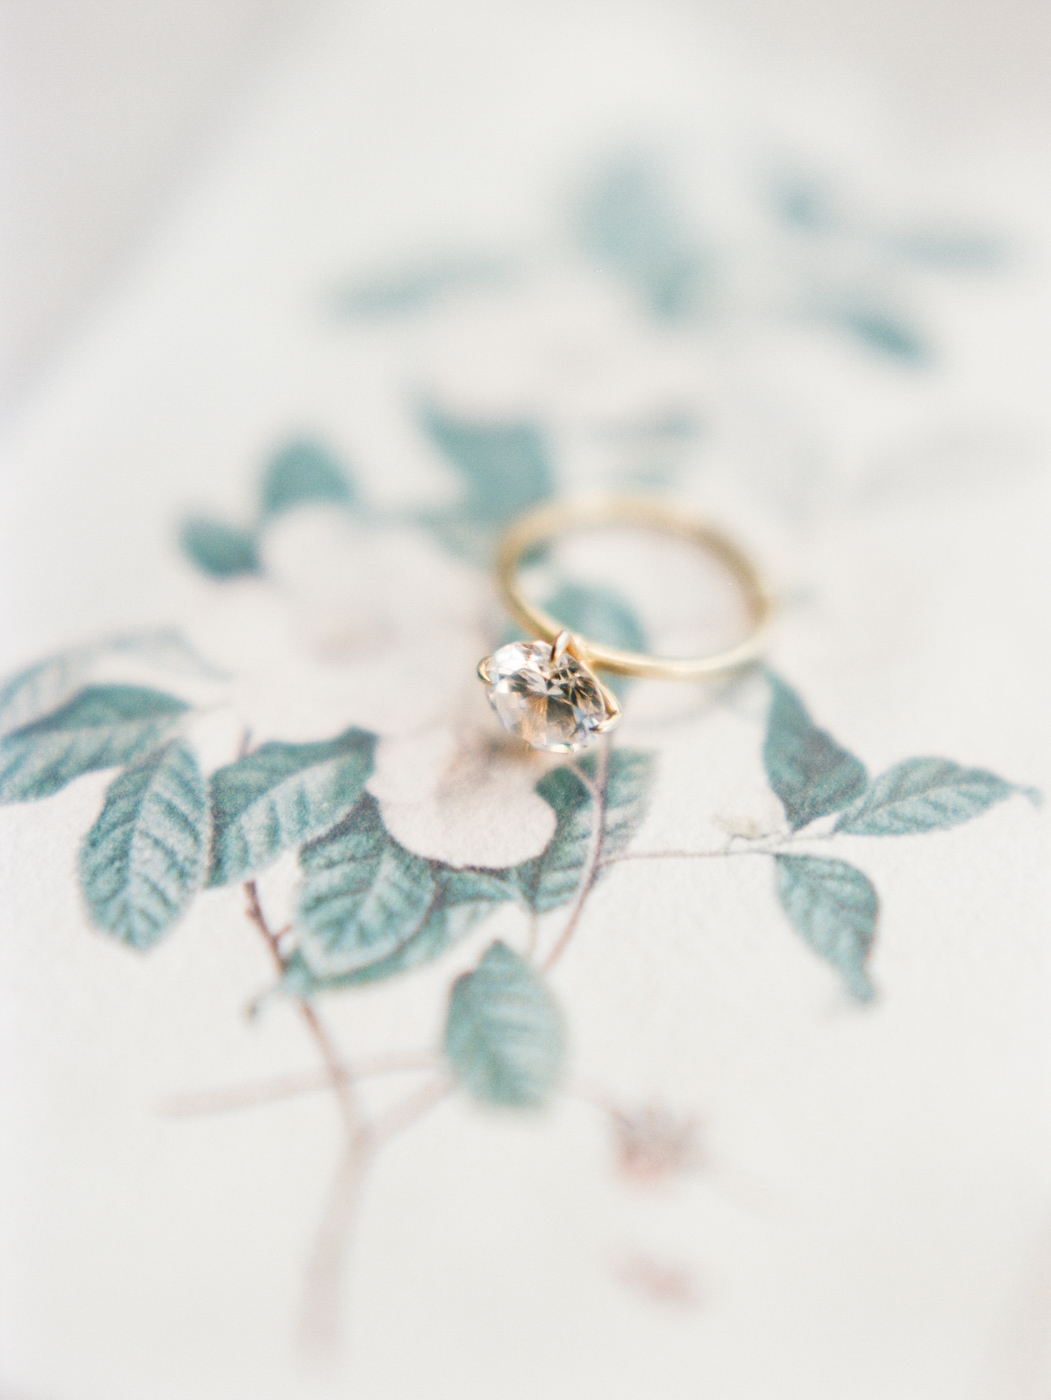 Savannah wedding solitaire ring gold film